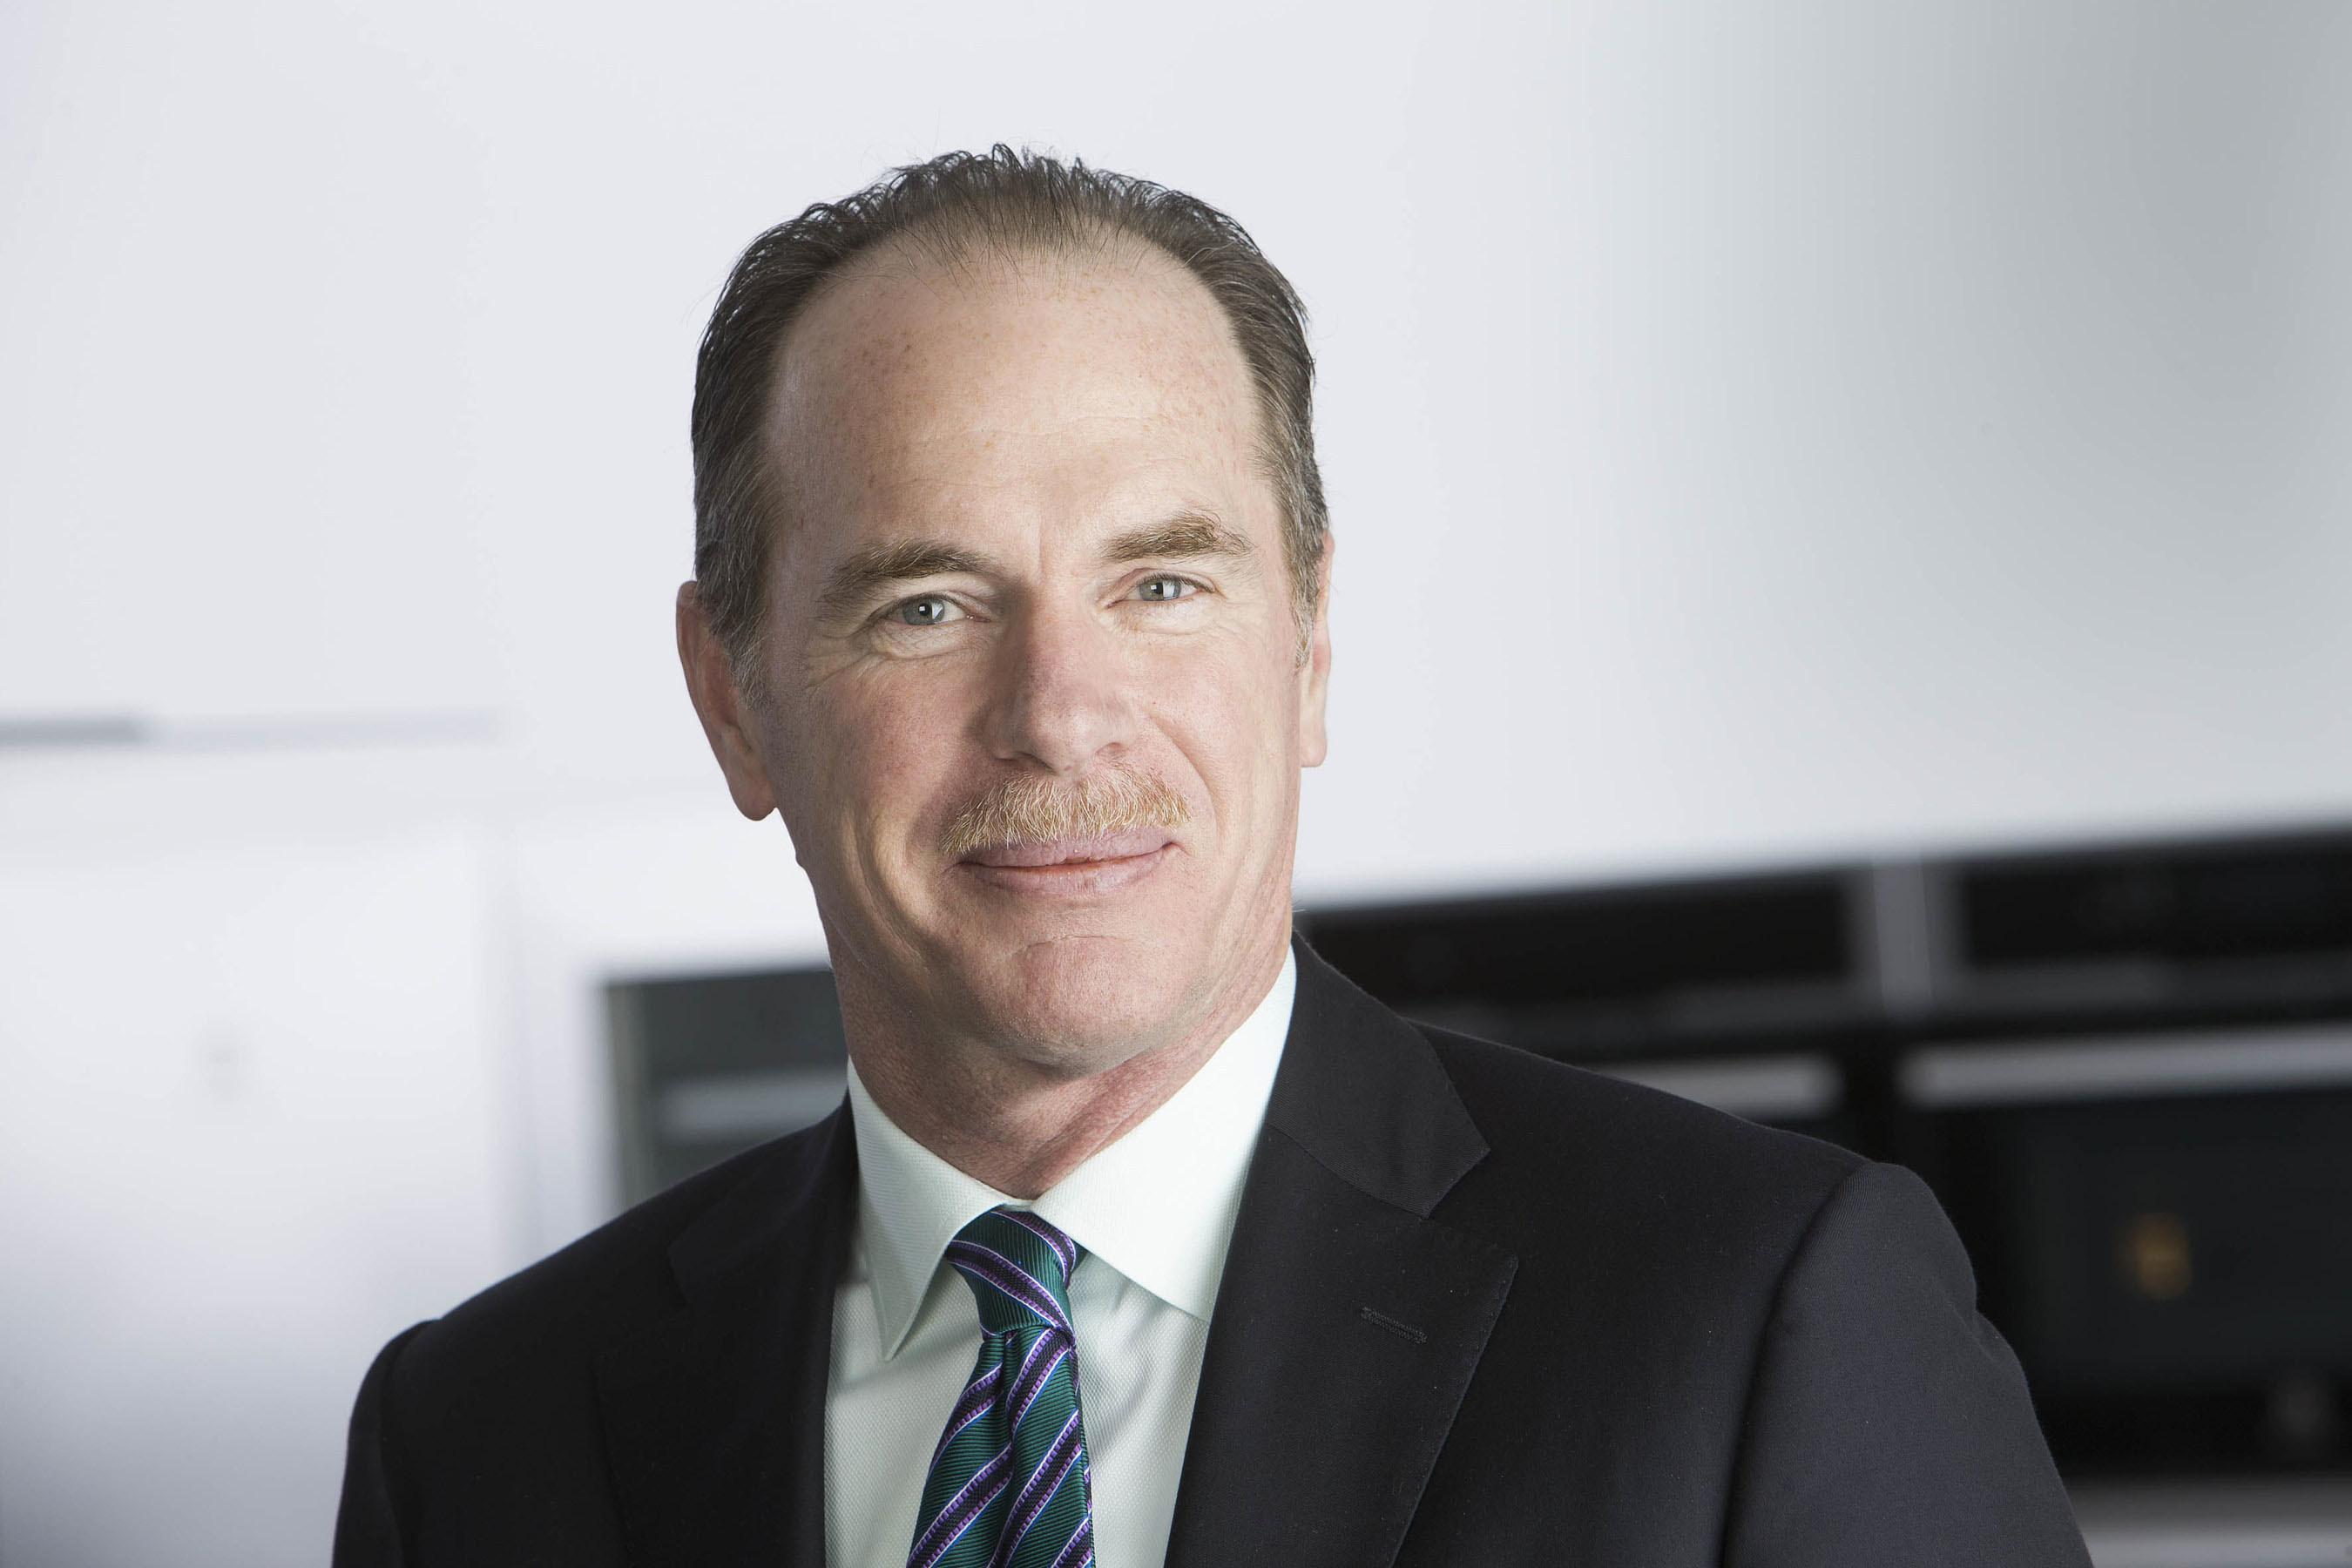 "Electrolux CEO Keith McLoughlin to vigorously contest DOJ opposition of GE Appliances acquisition; ""Deal accelerates consumer innovation, choices,"" says McLoughlin."